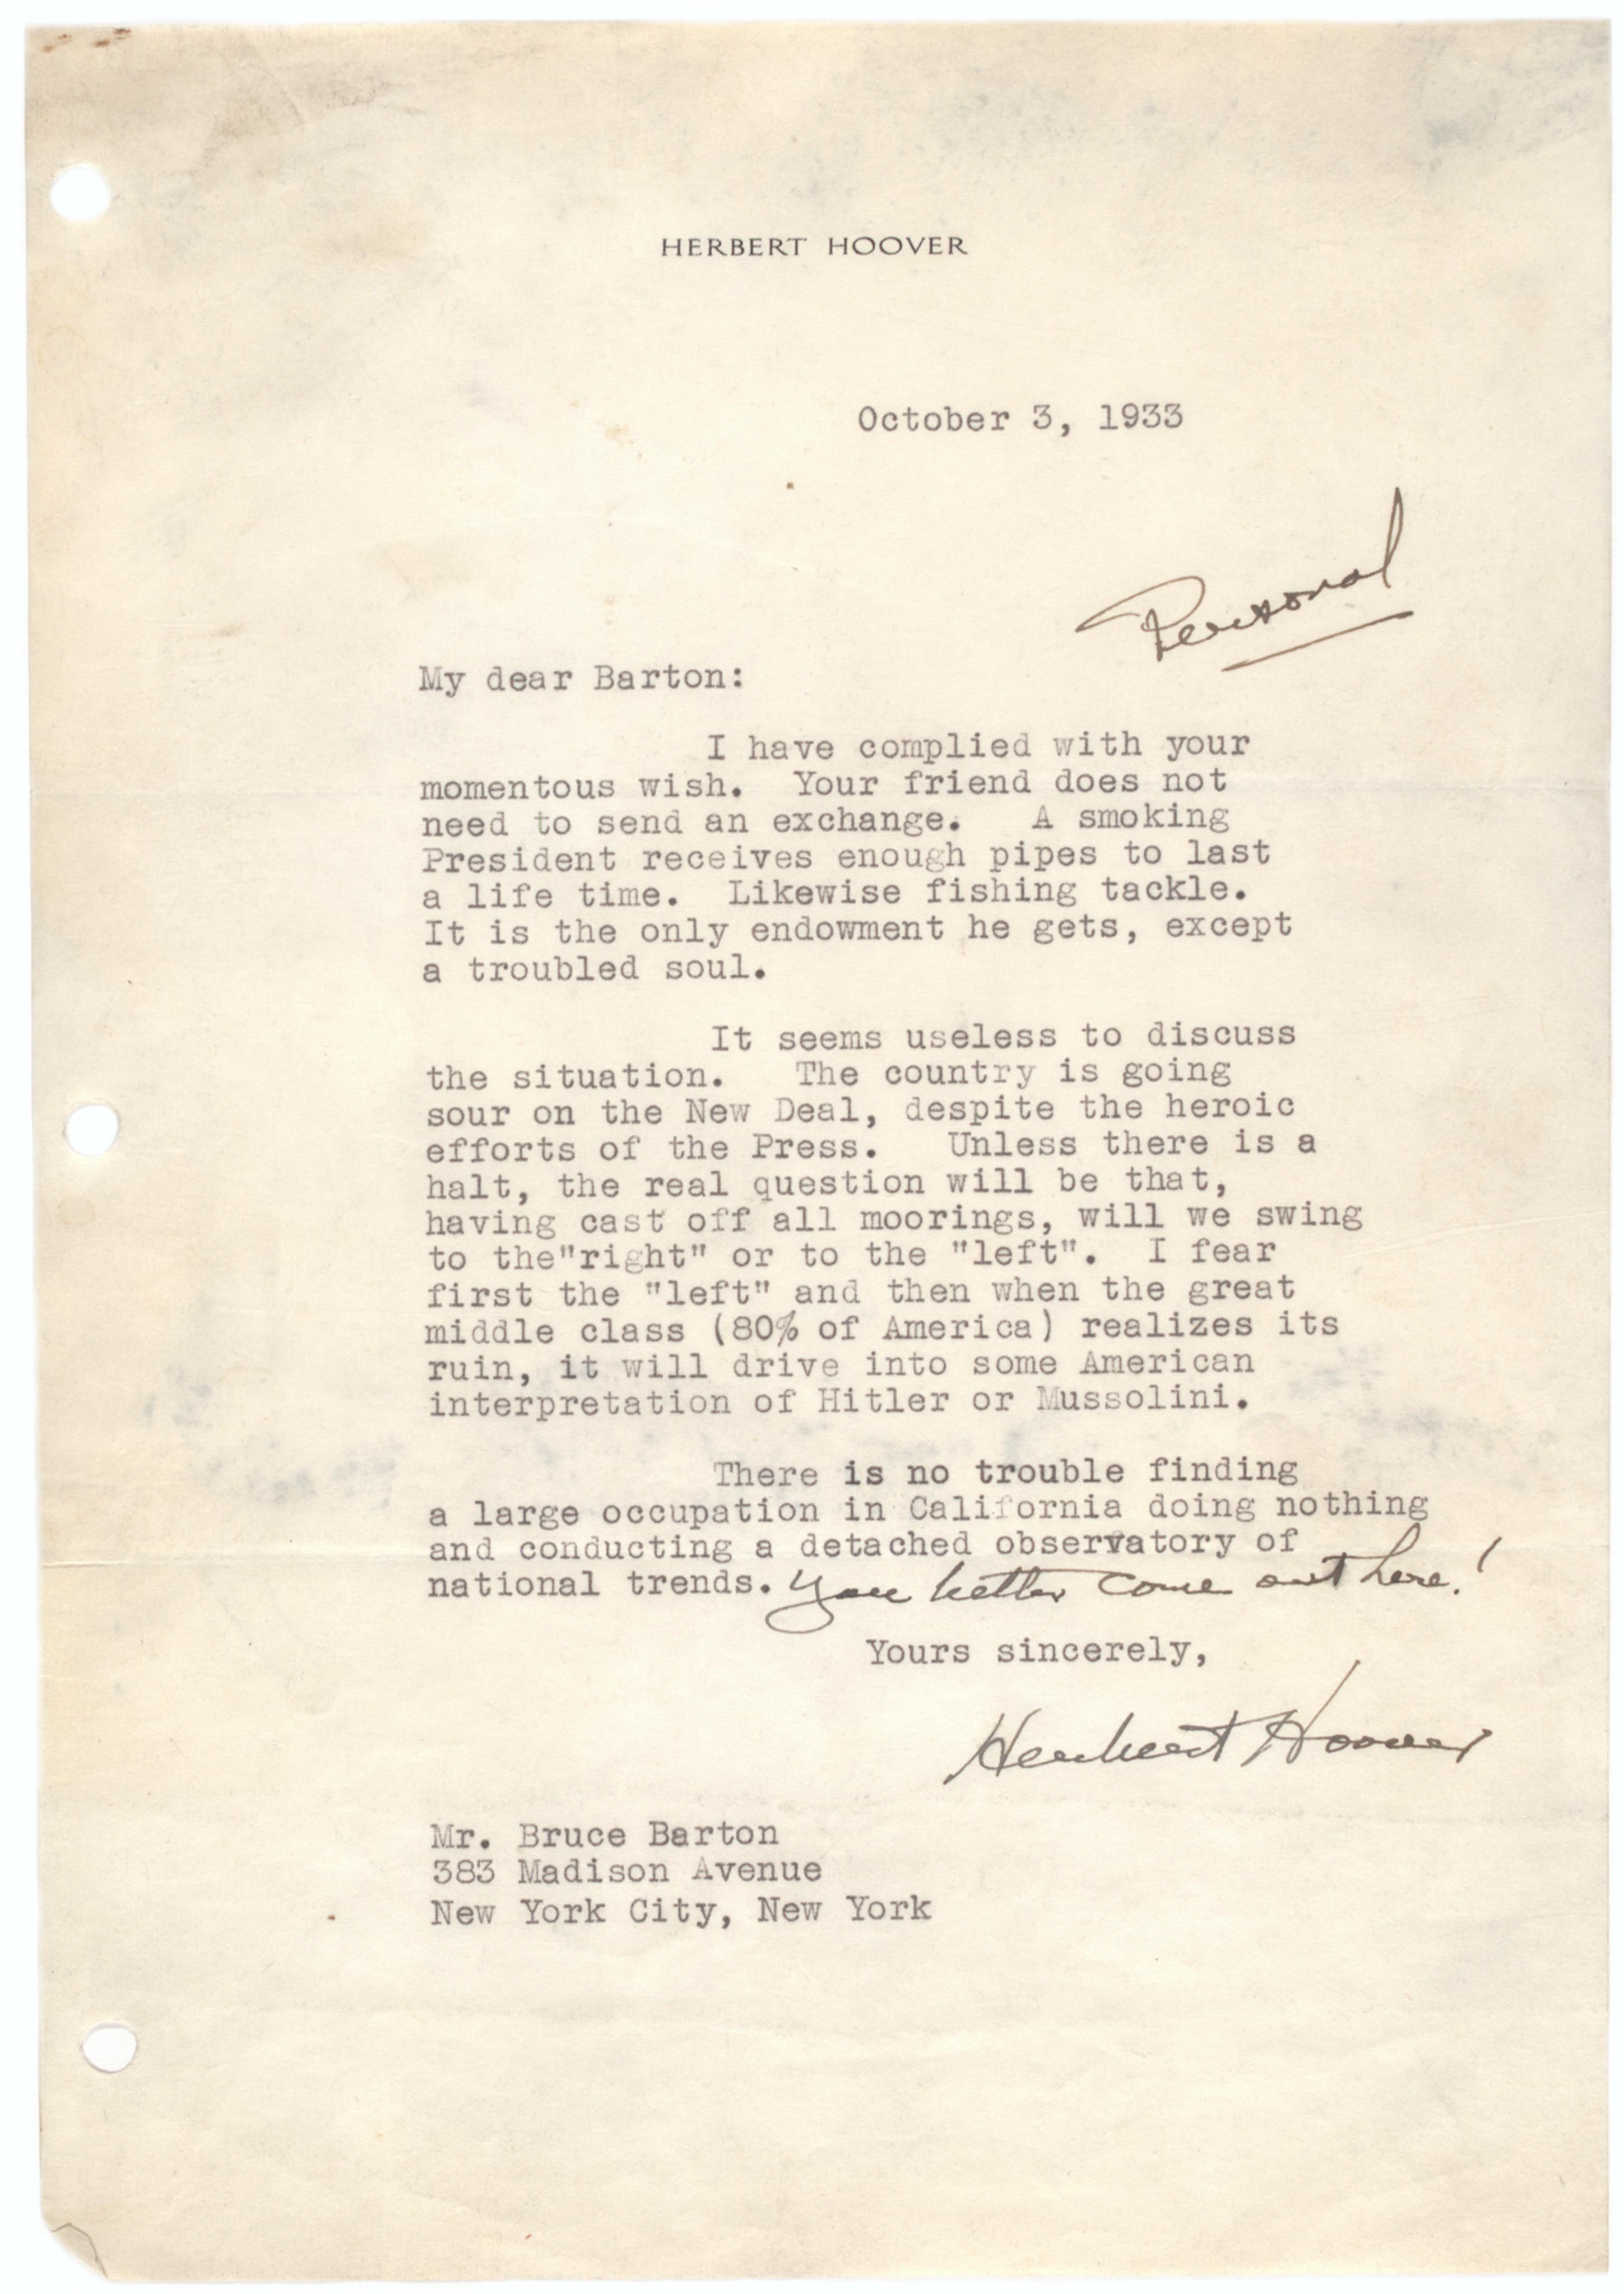 Herbert Hoover to Bruce Barton, October 3, 1933. (Gilder Lehrman Collection)